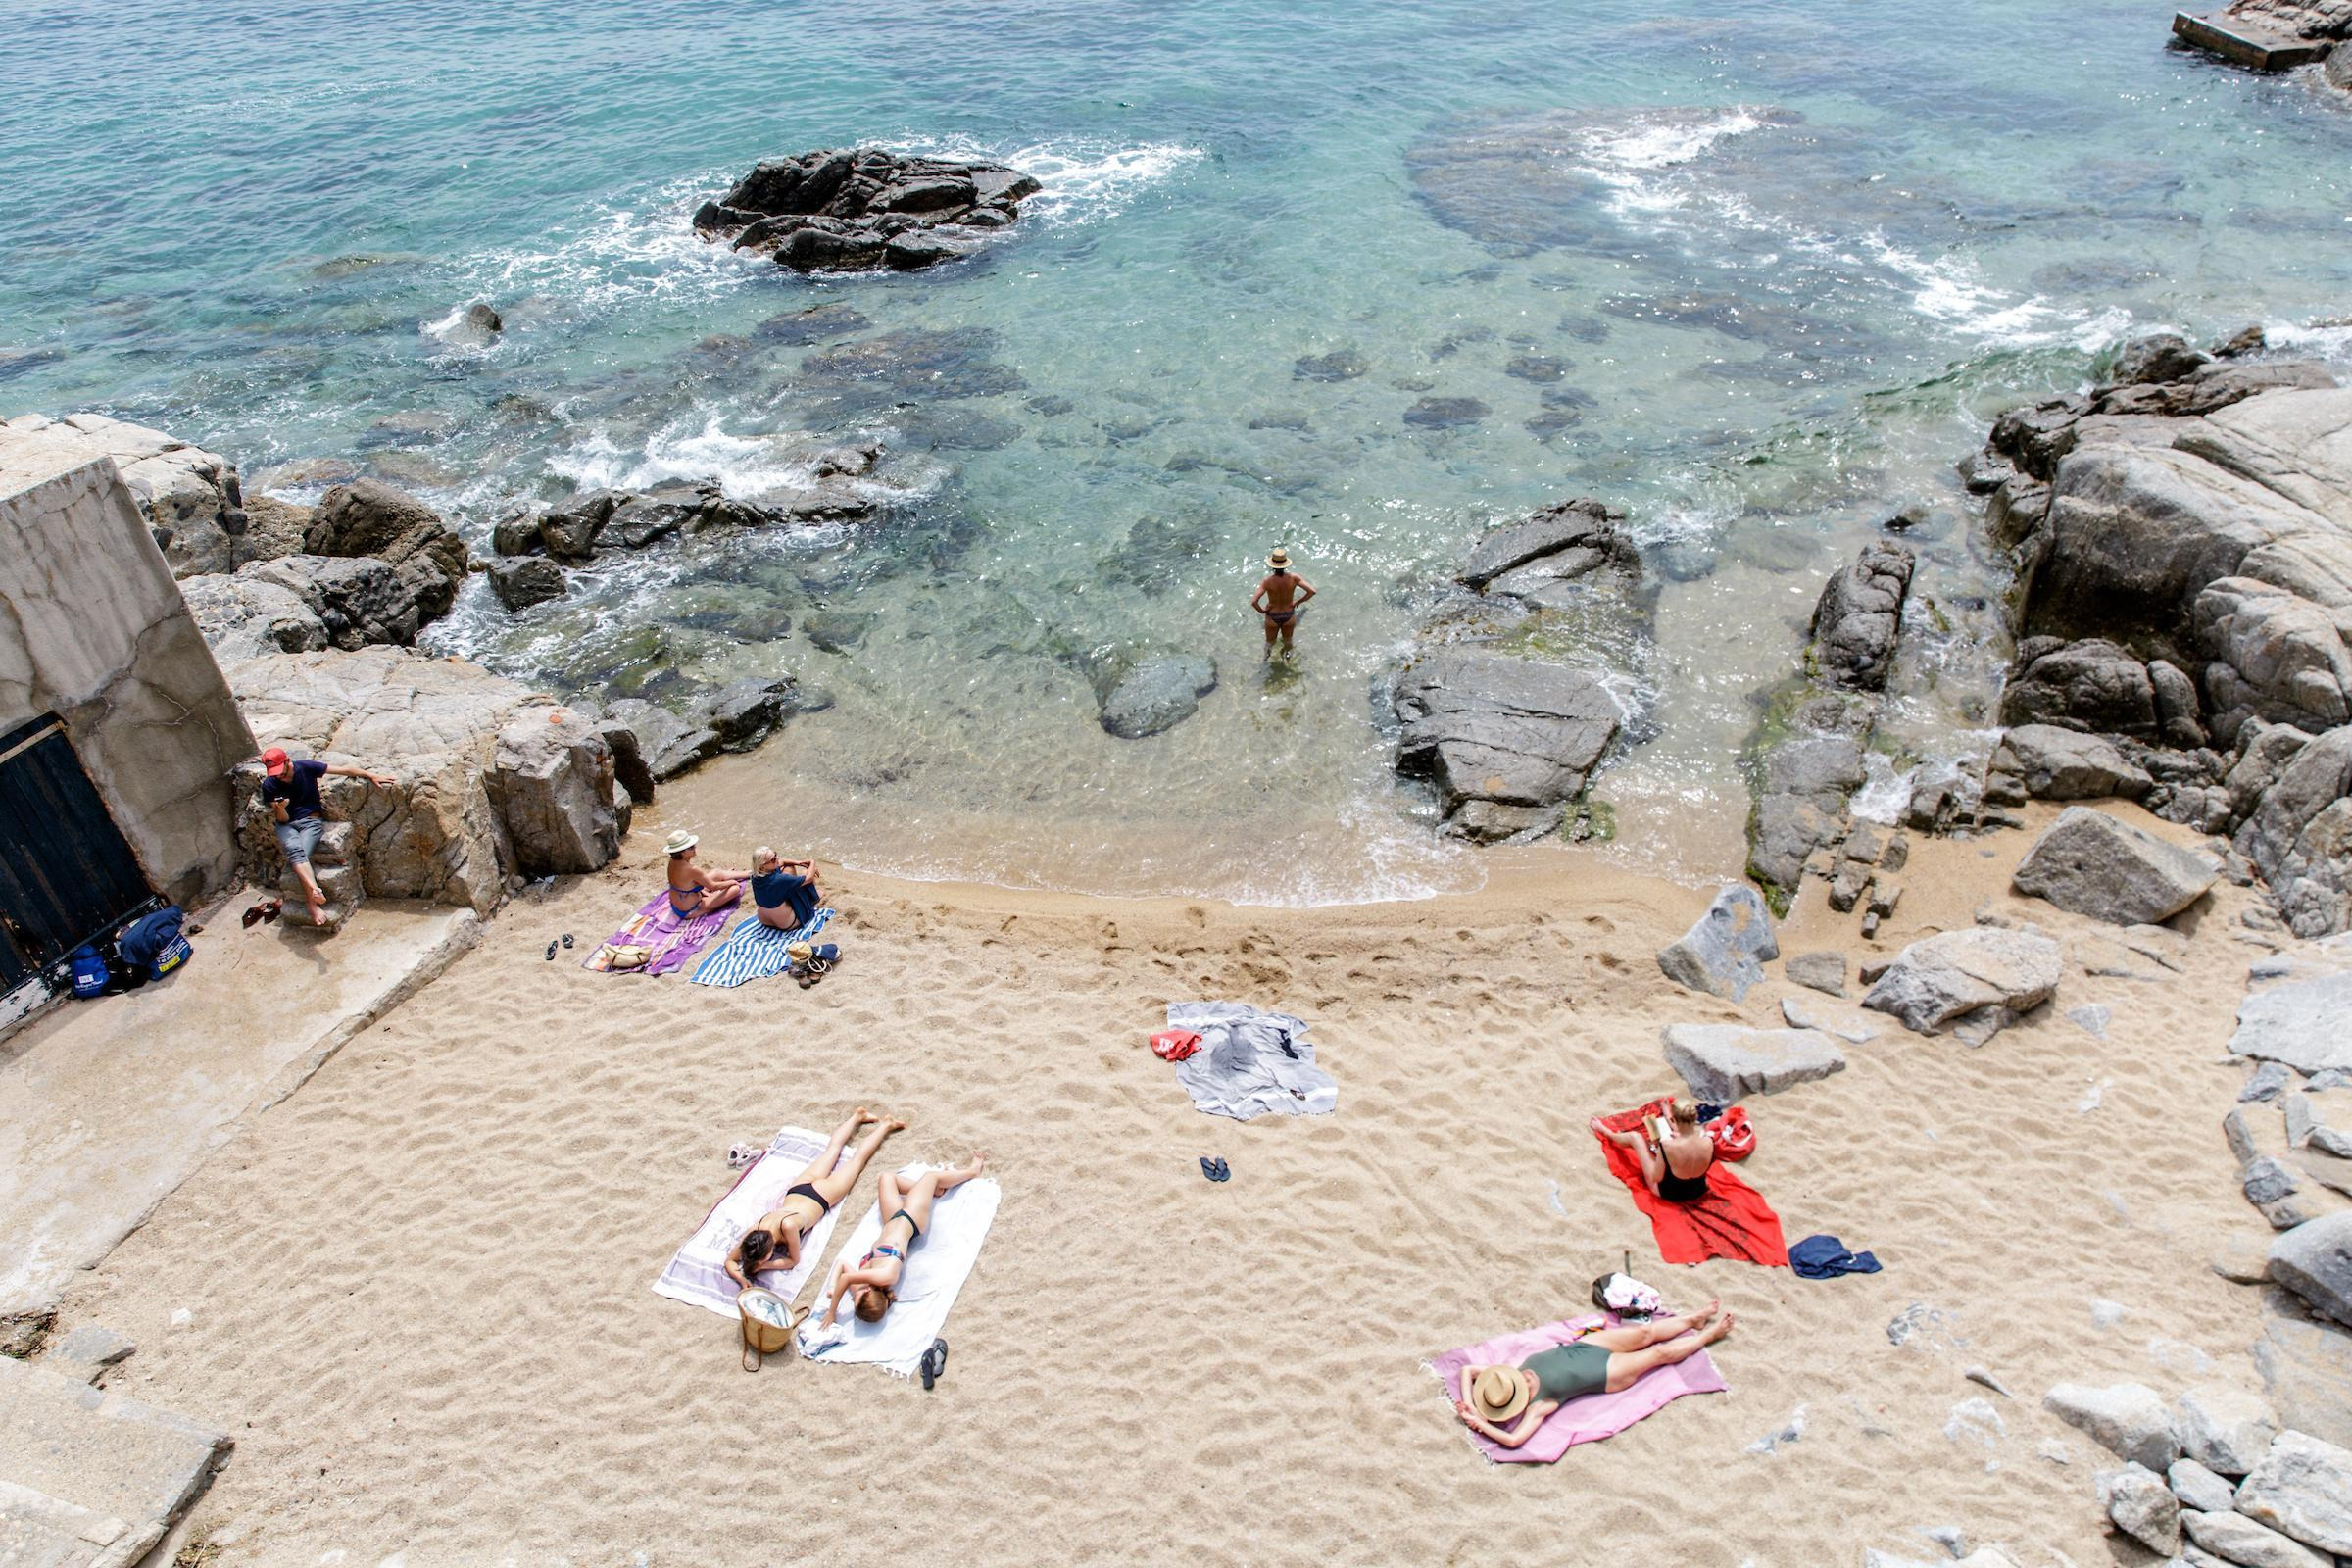 Costa Brava Day Trips From Barcelona